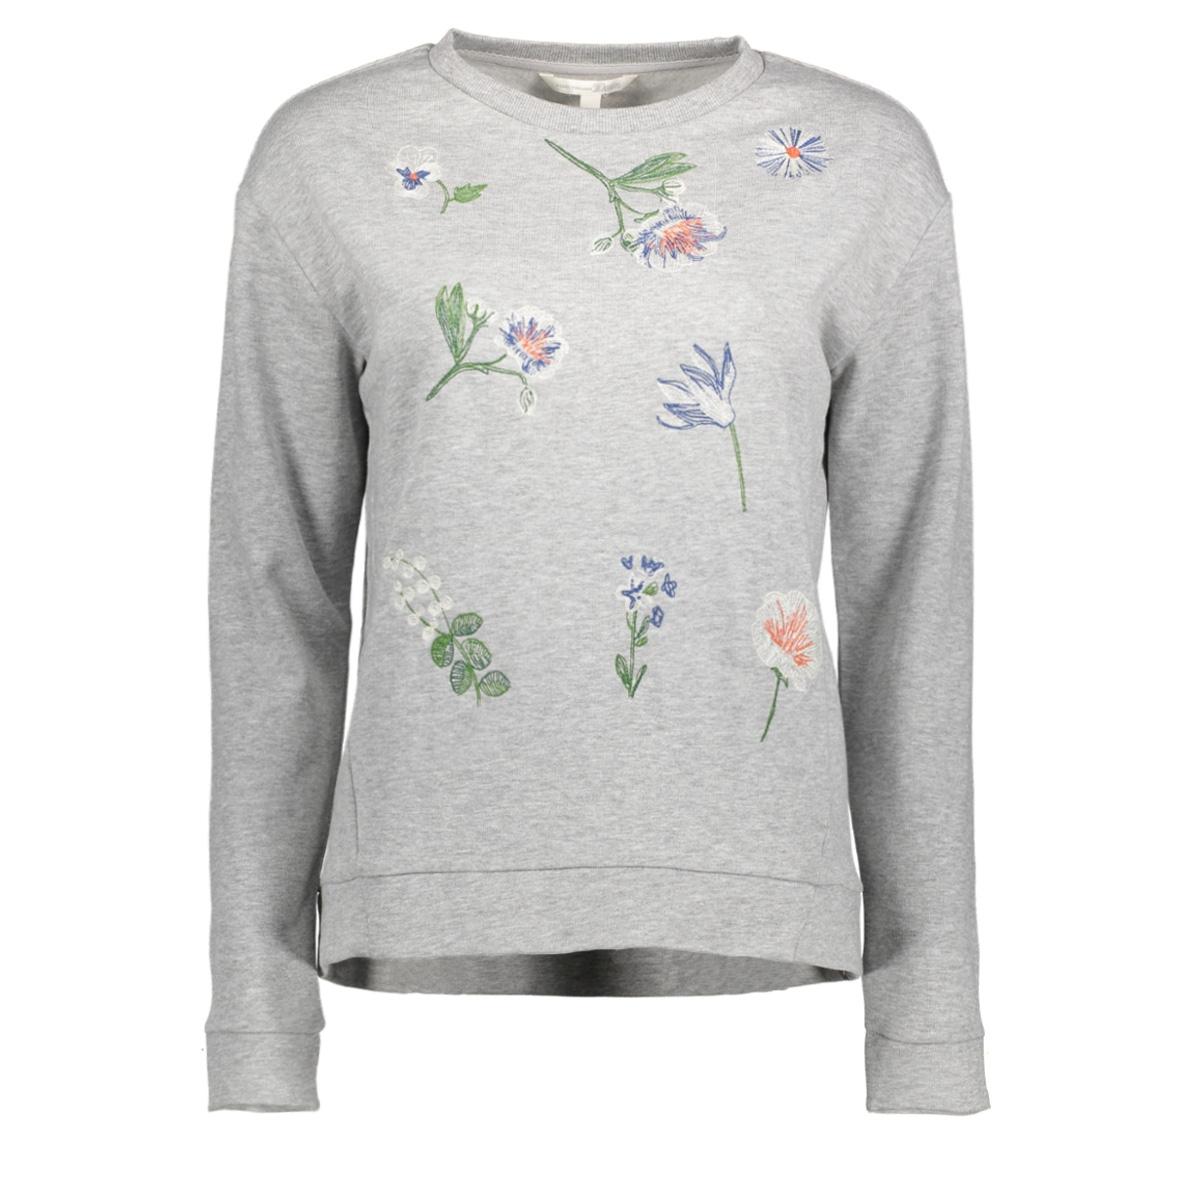 2555048.62.71 tom tailor sweater 2973